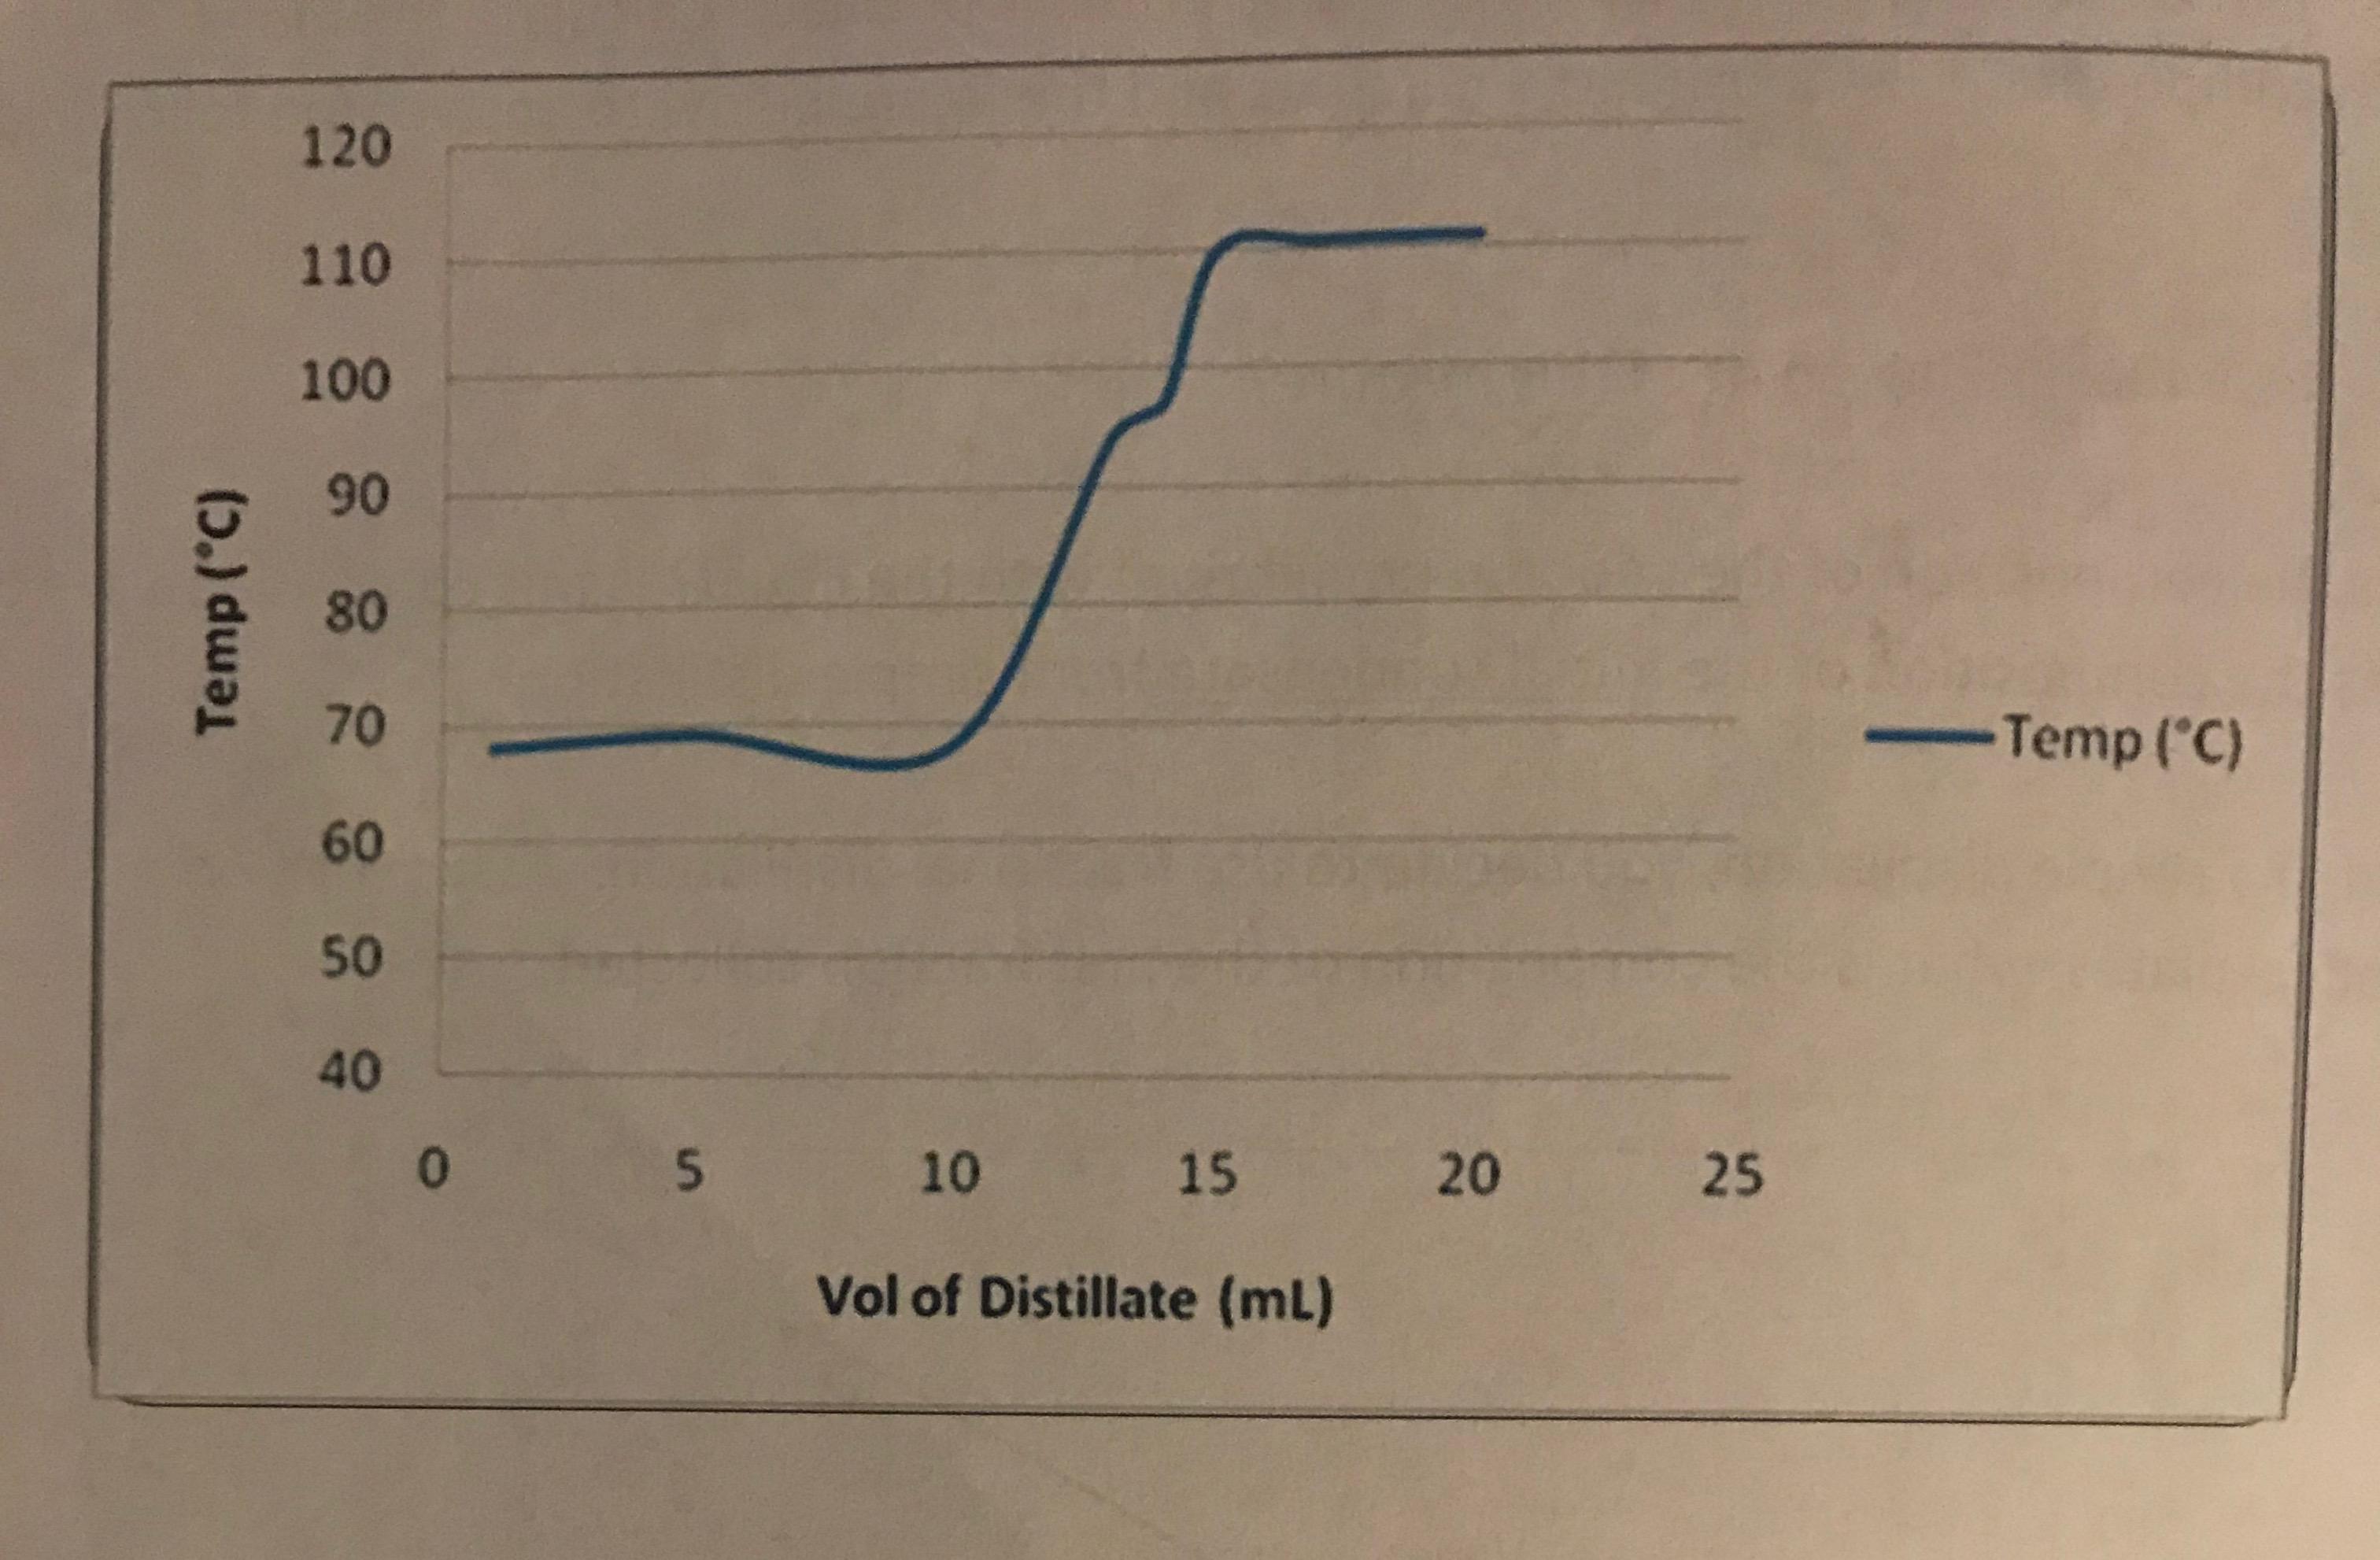 120 110 100 90 2 80 70 60 50 40 ー-Temp (°C) 0 10 15 20 25 Vol of Distillate (mL)